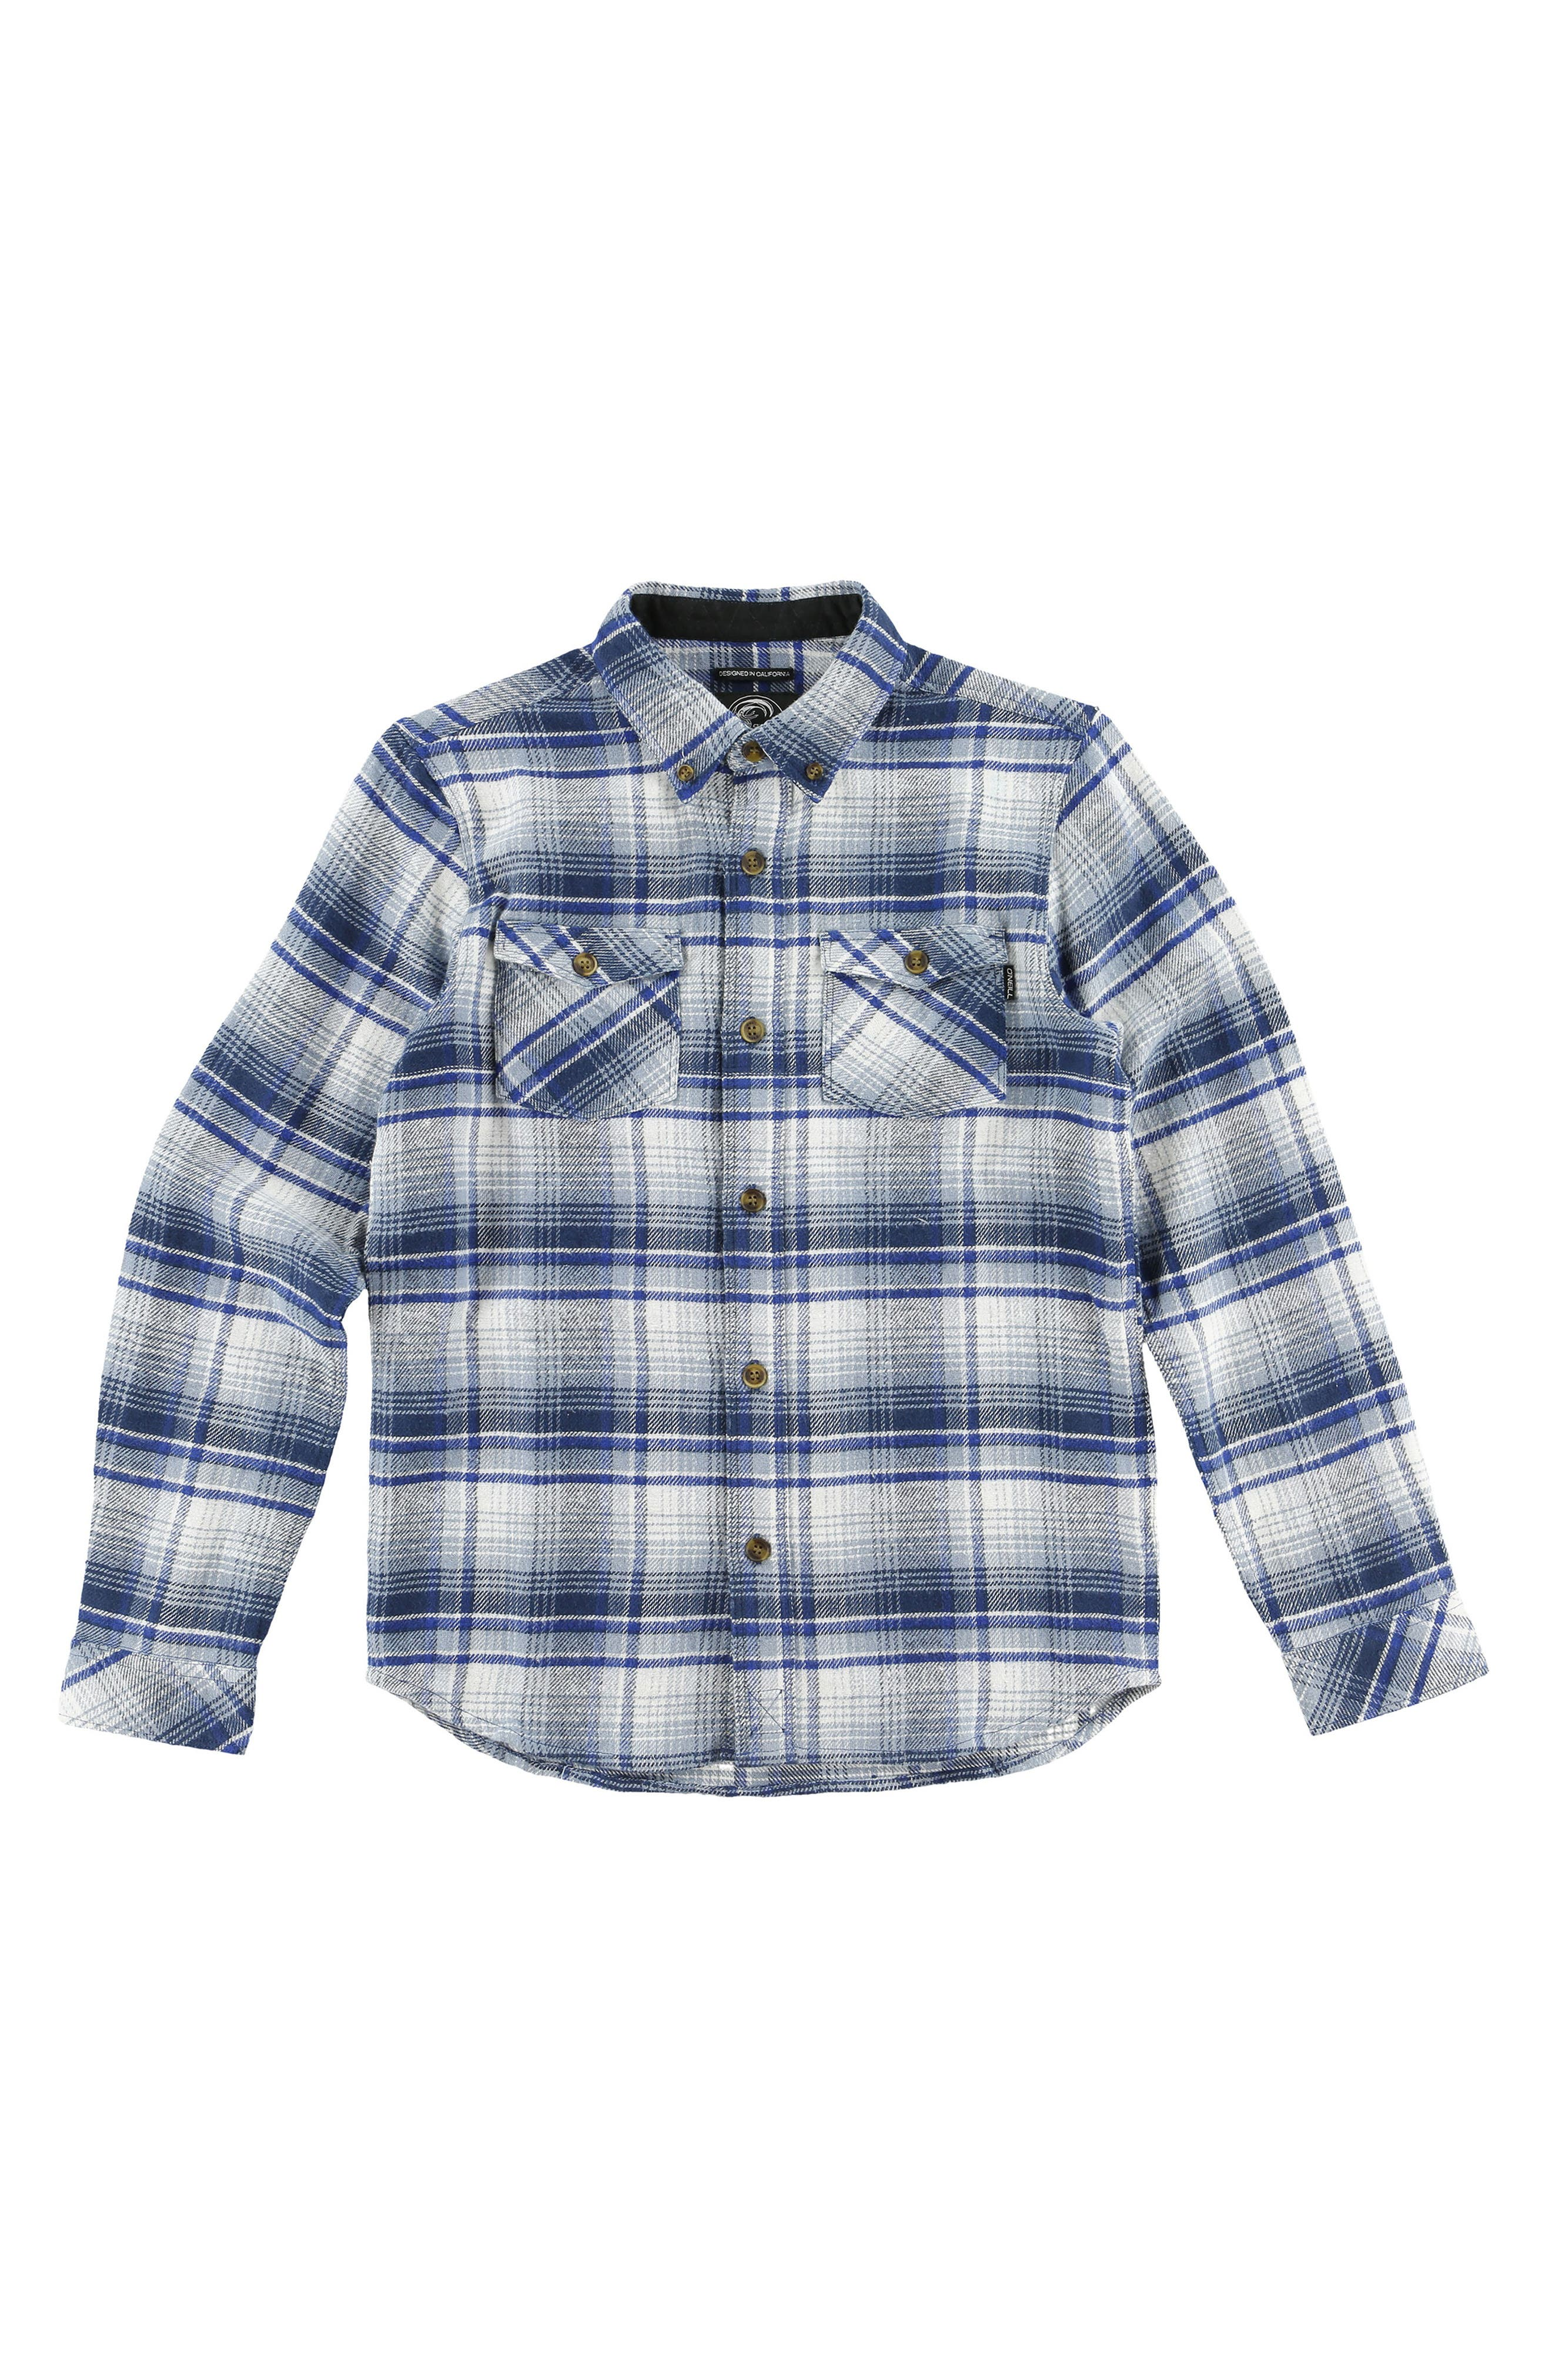 Butler Plaid Flannel Shirt,                             Alternate thumbnail 2, color,                             472